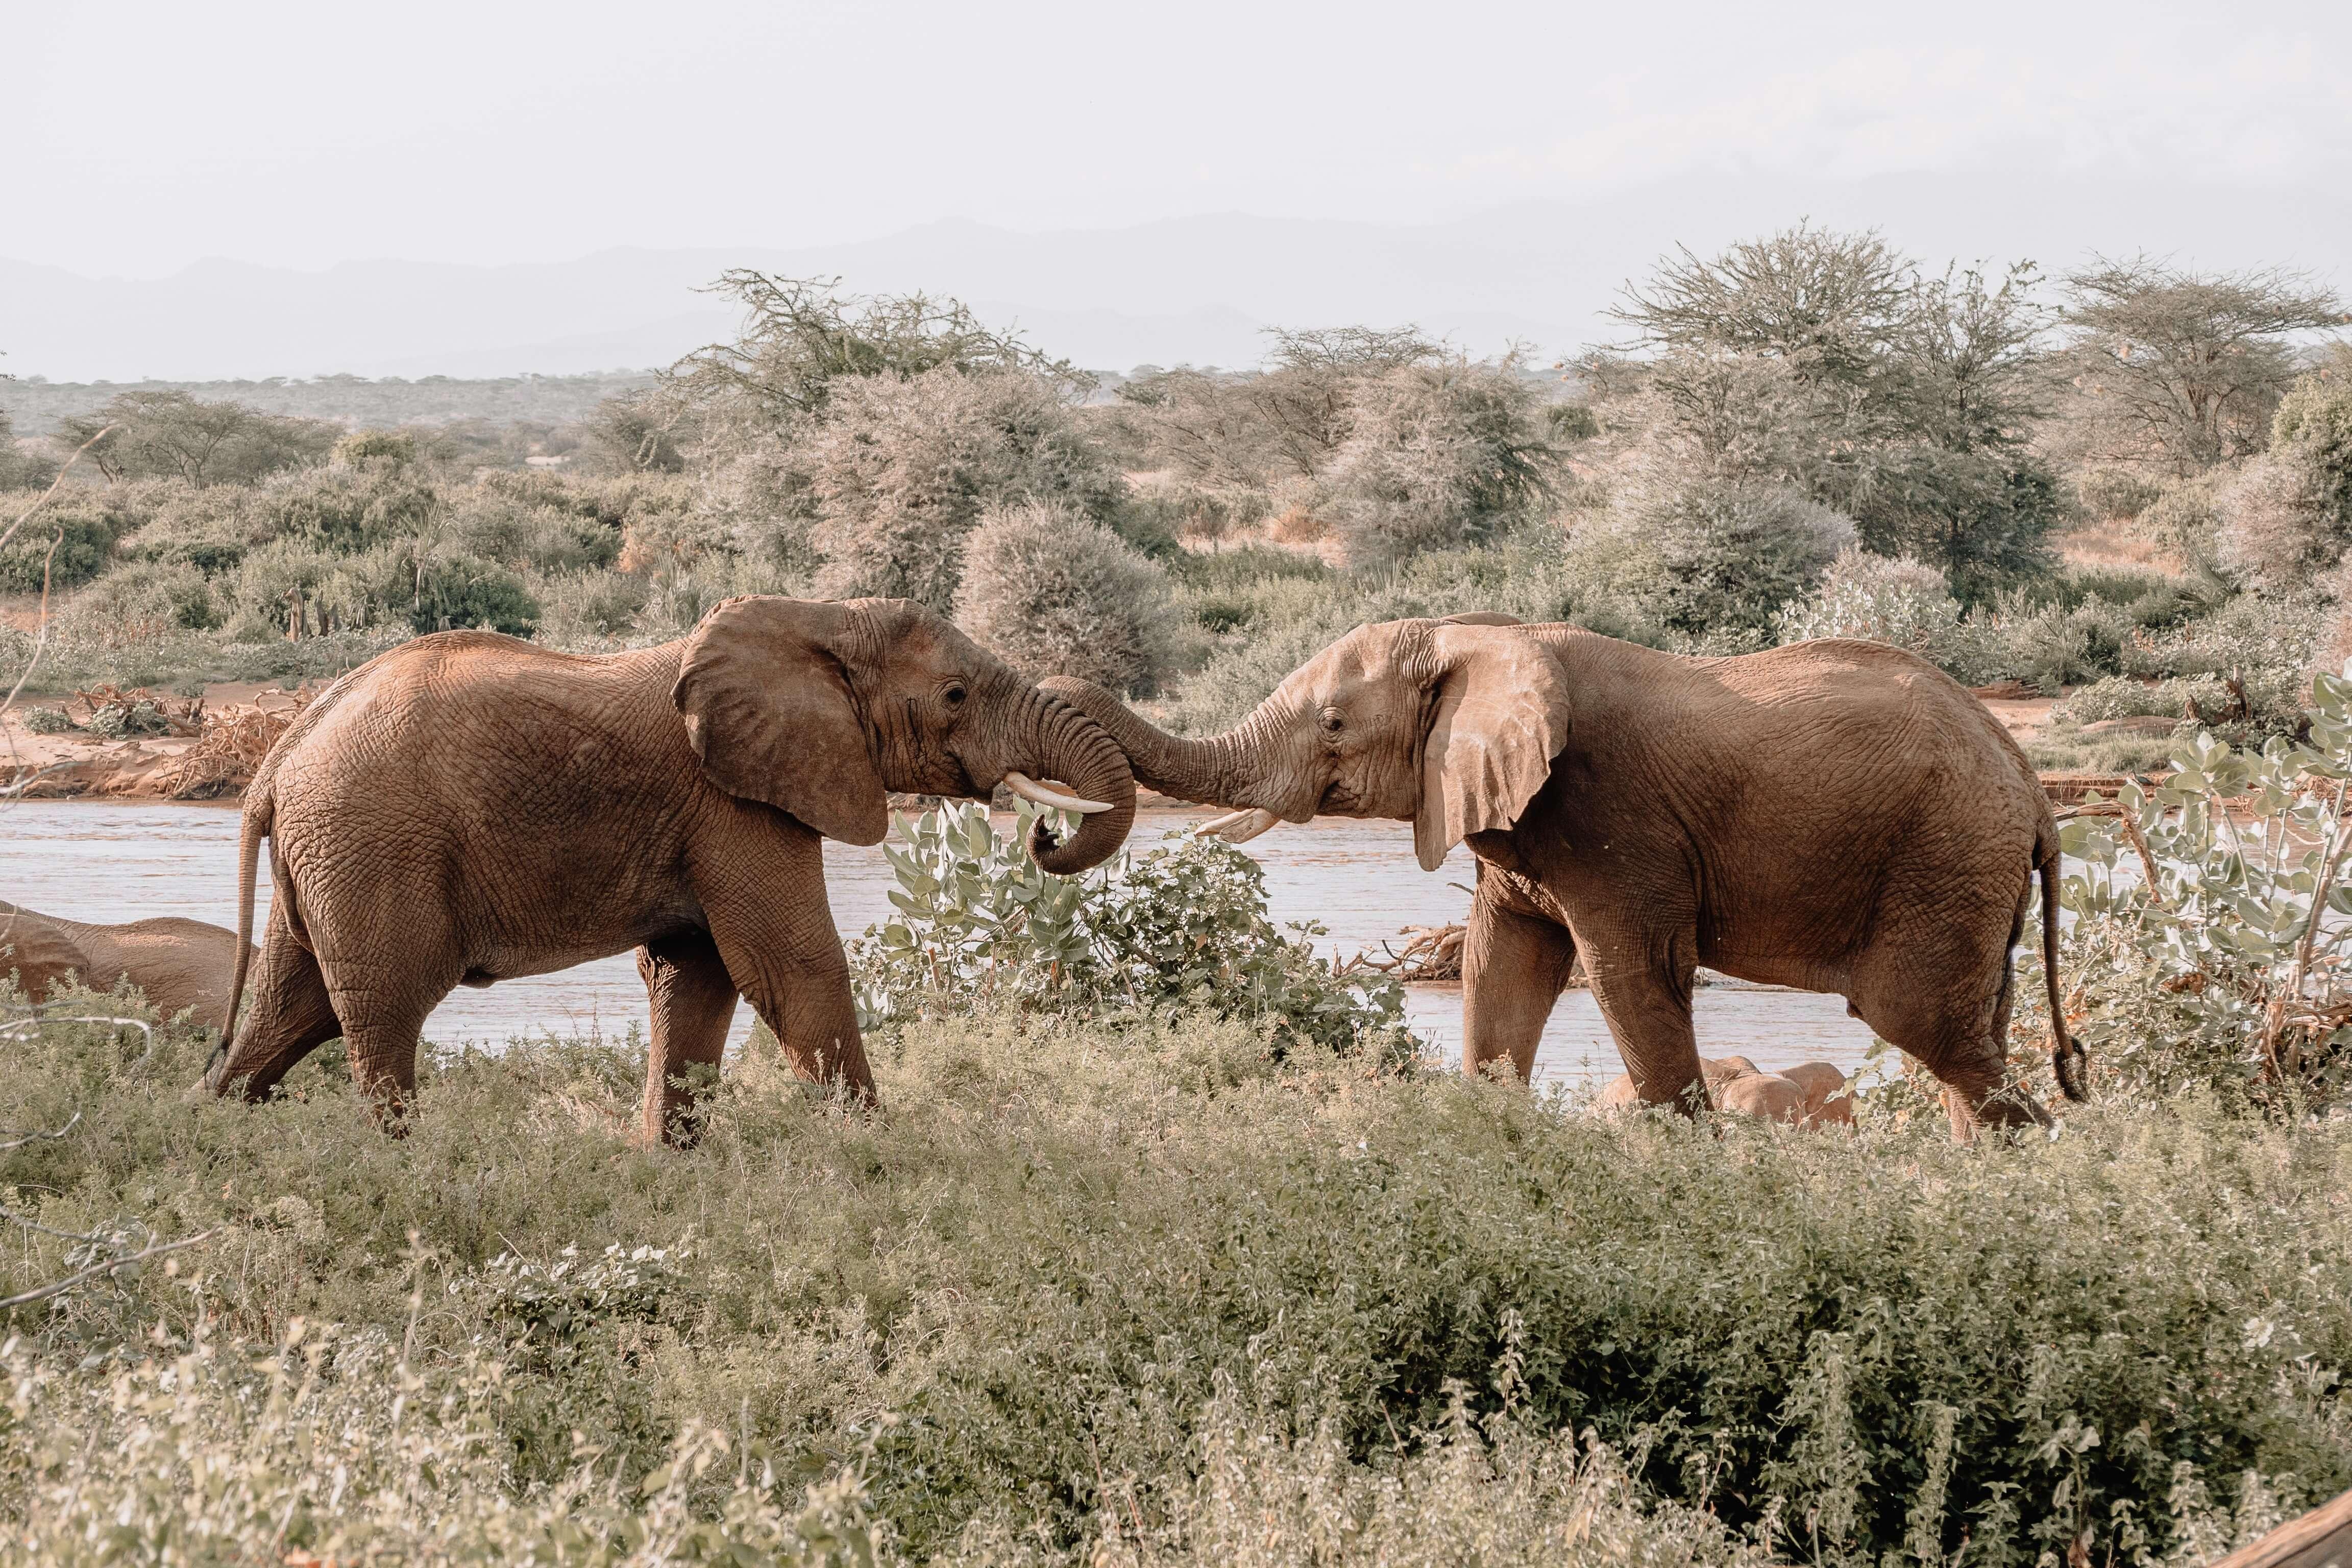 Guardians - Elephants